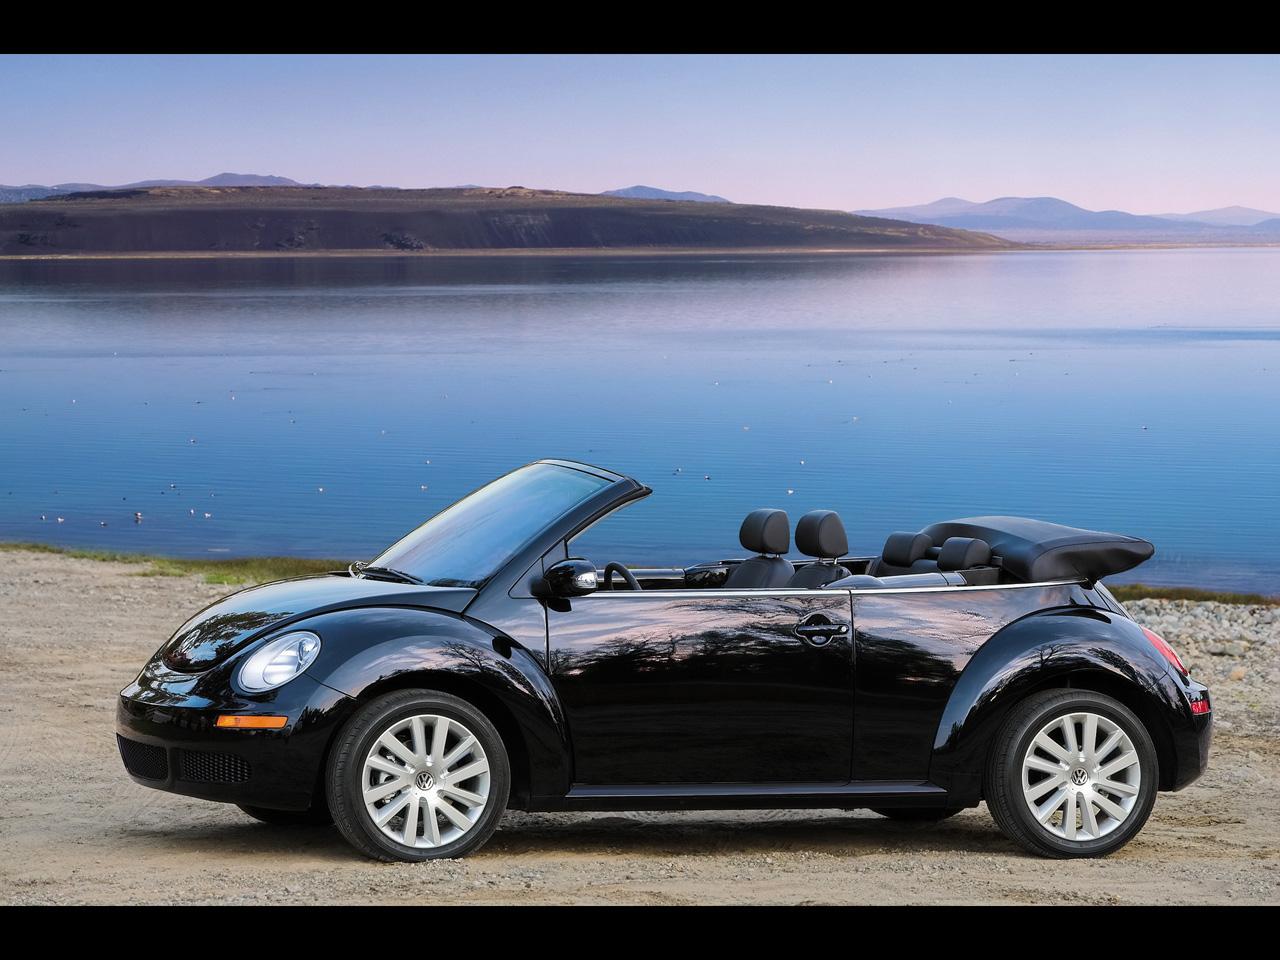 volkswagen beetle convertible christine o 39 donnell. Black Bedroom Furniture Sets. Home Design Ideas